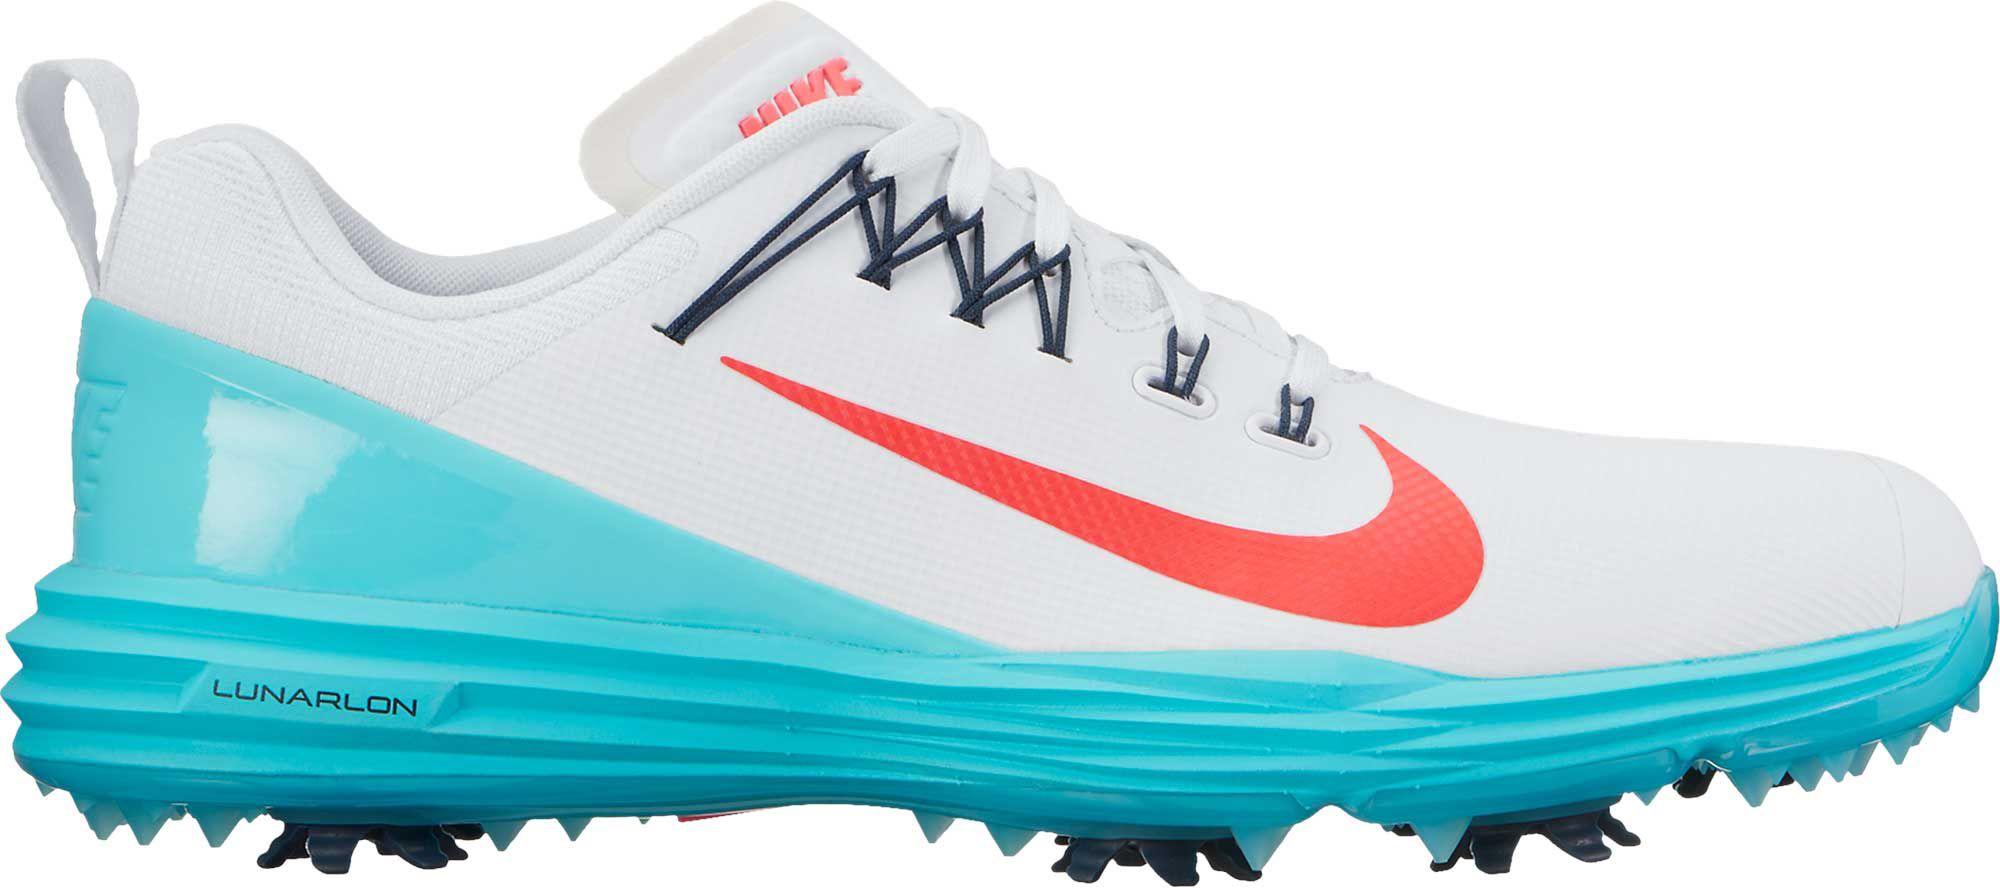 44854d6b1db ... Nike Womens Lunar Command 2 Golf Shoes DICKS Sporting Goods ...